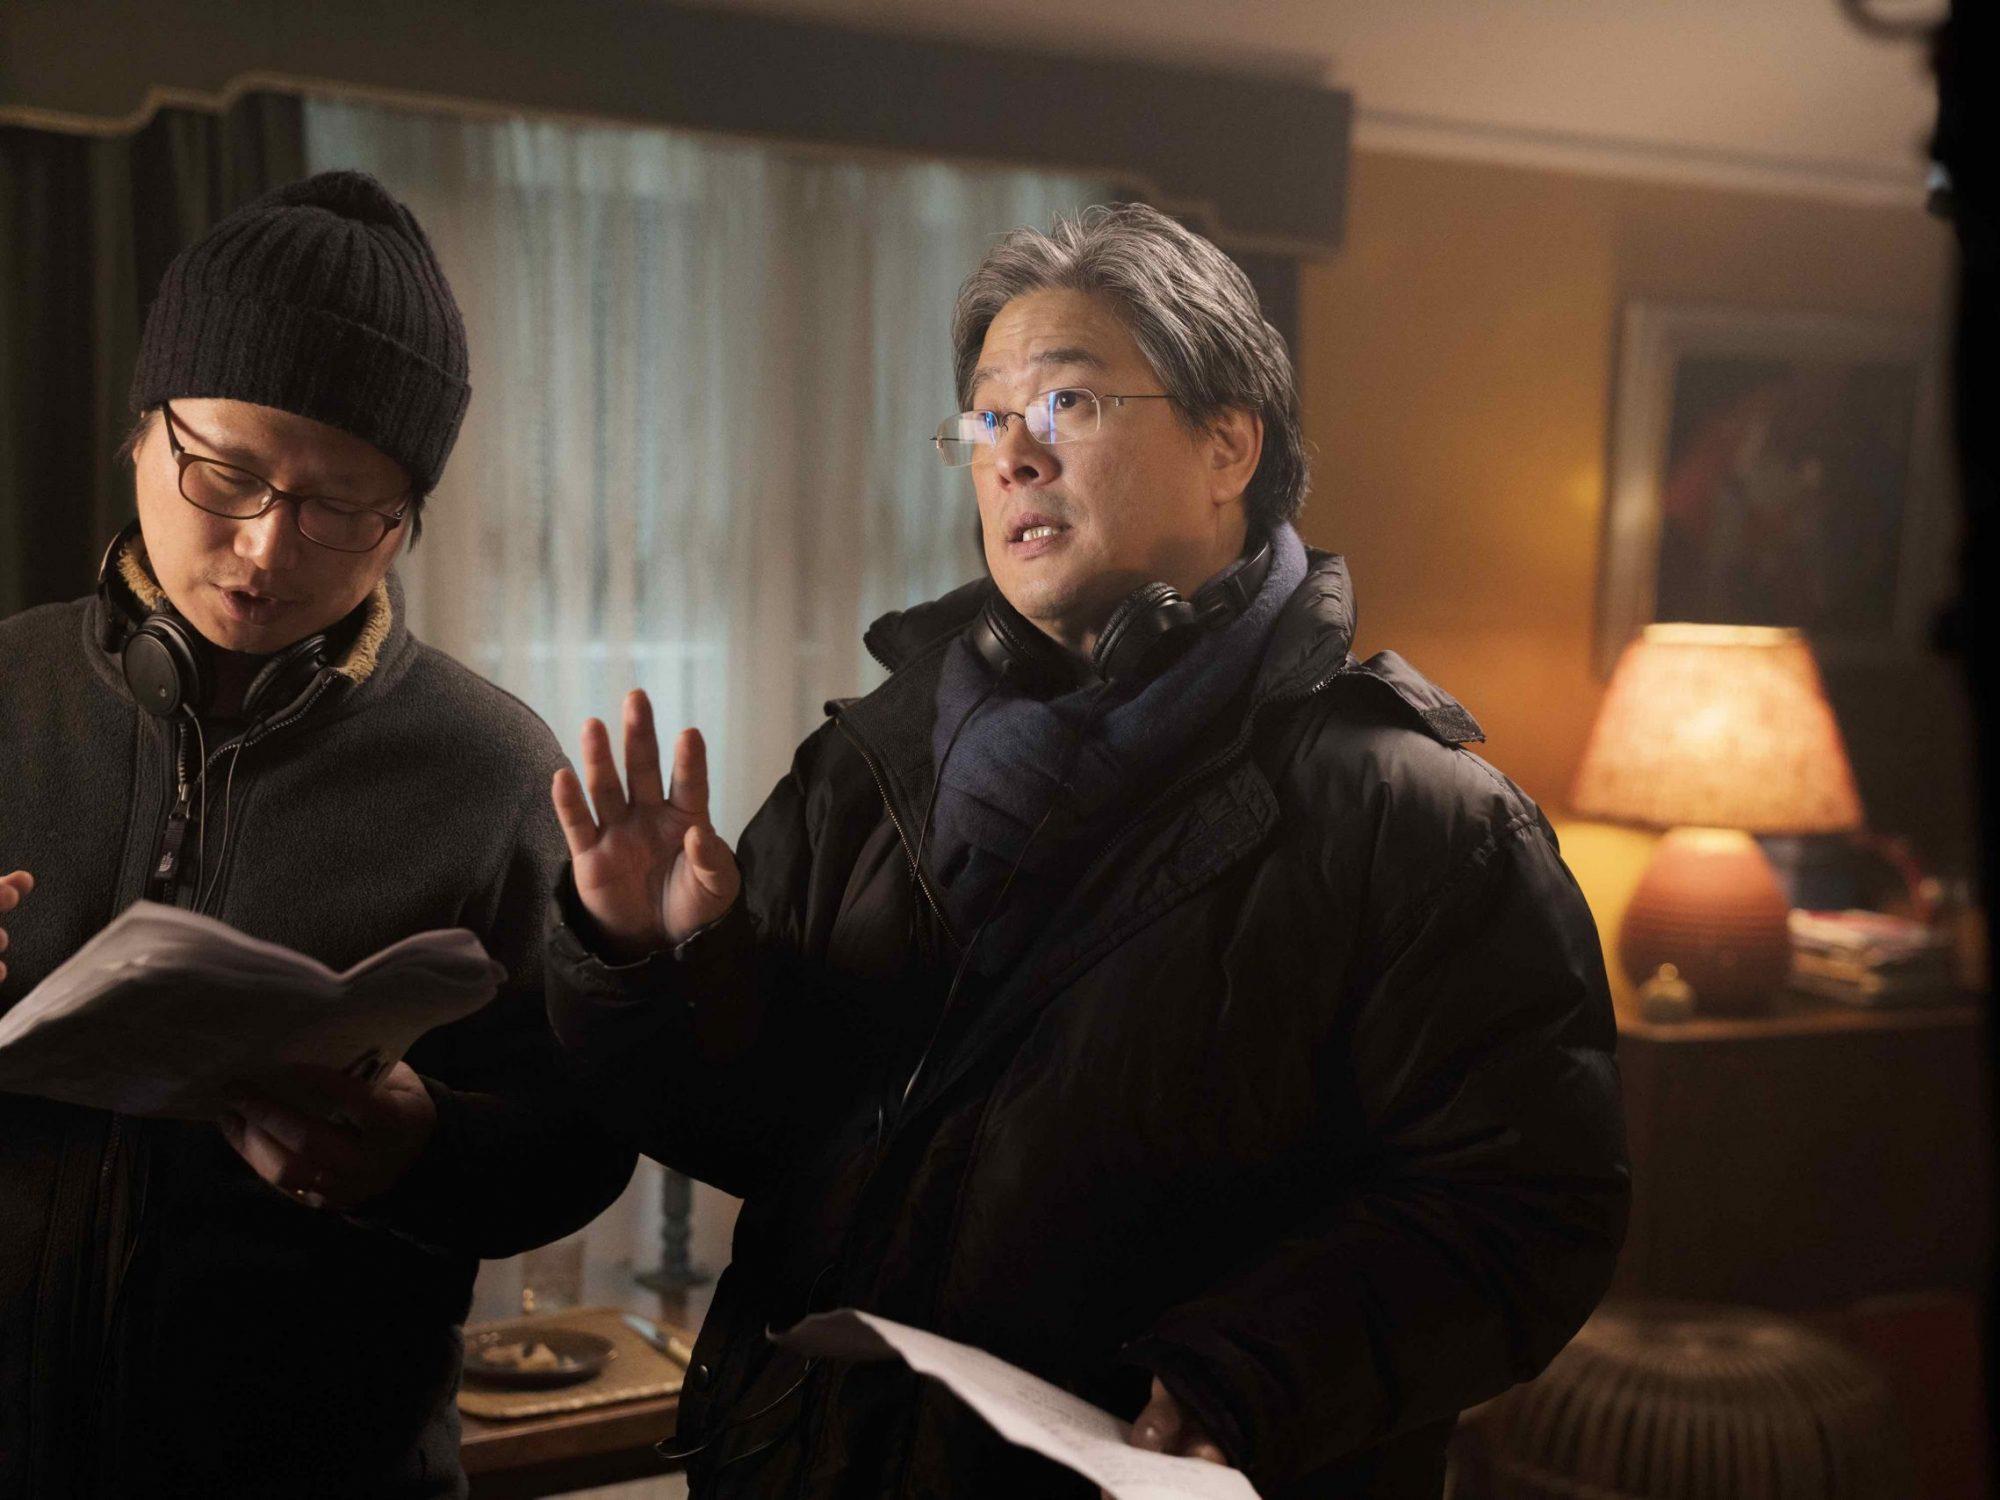 Park Chan-wook has begun work on his next film, a romantic murder mystery